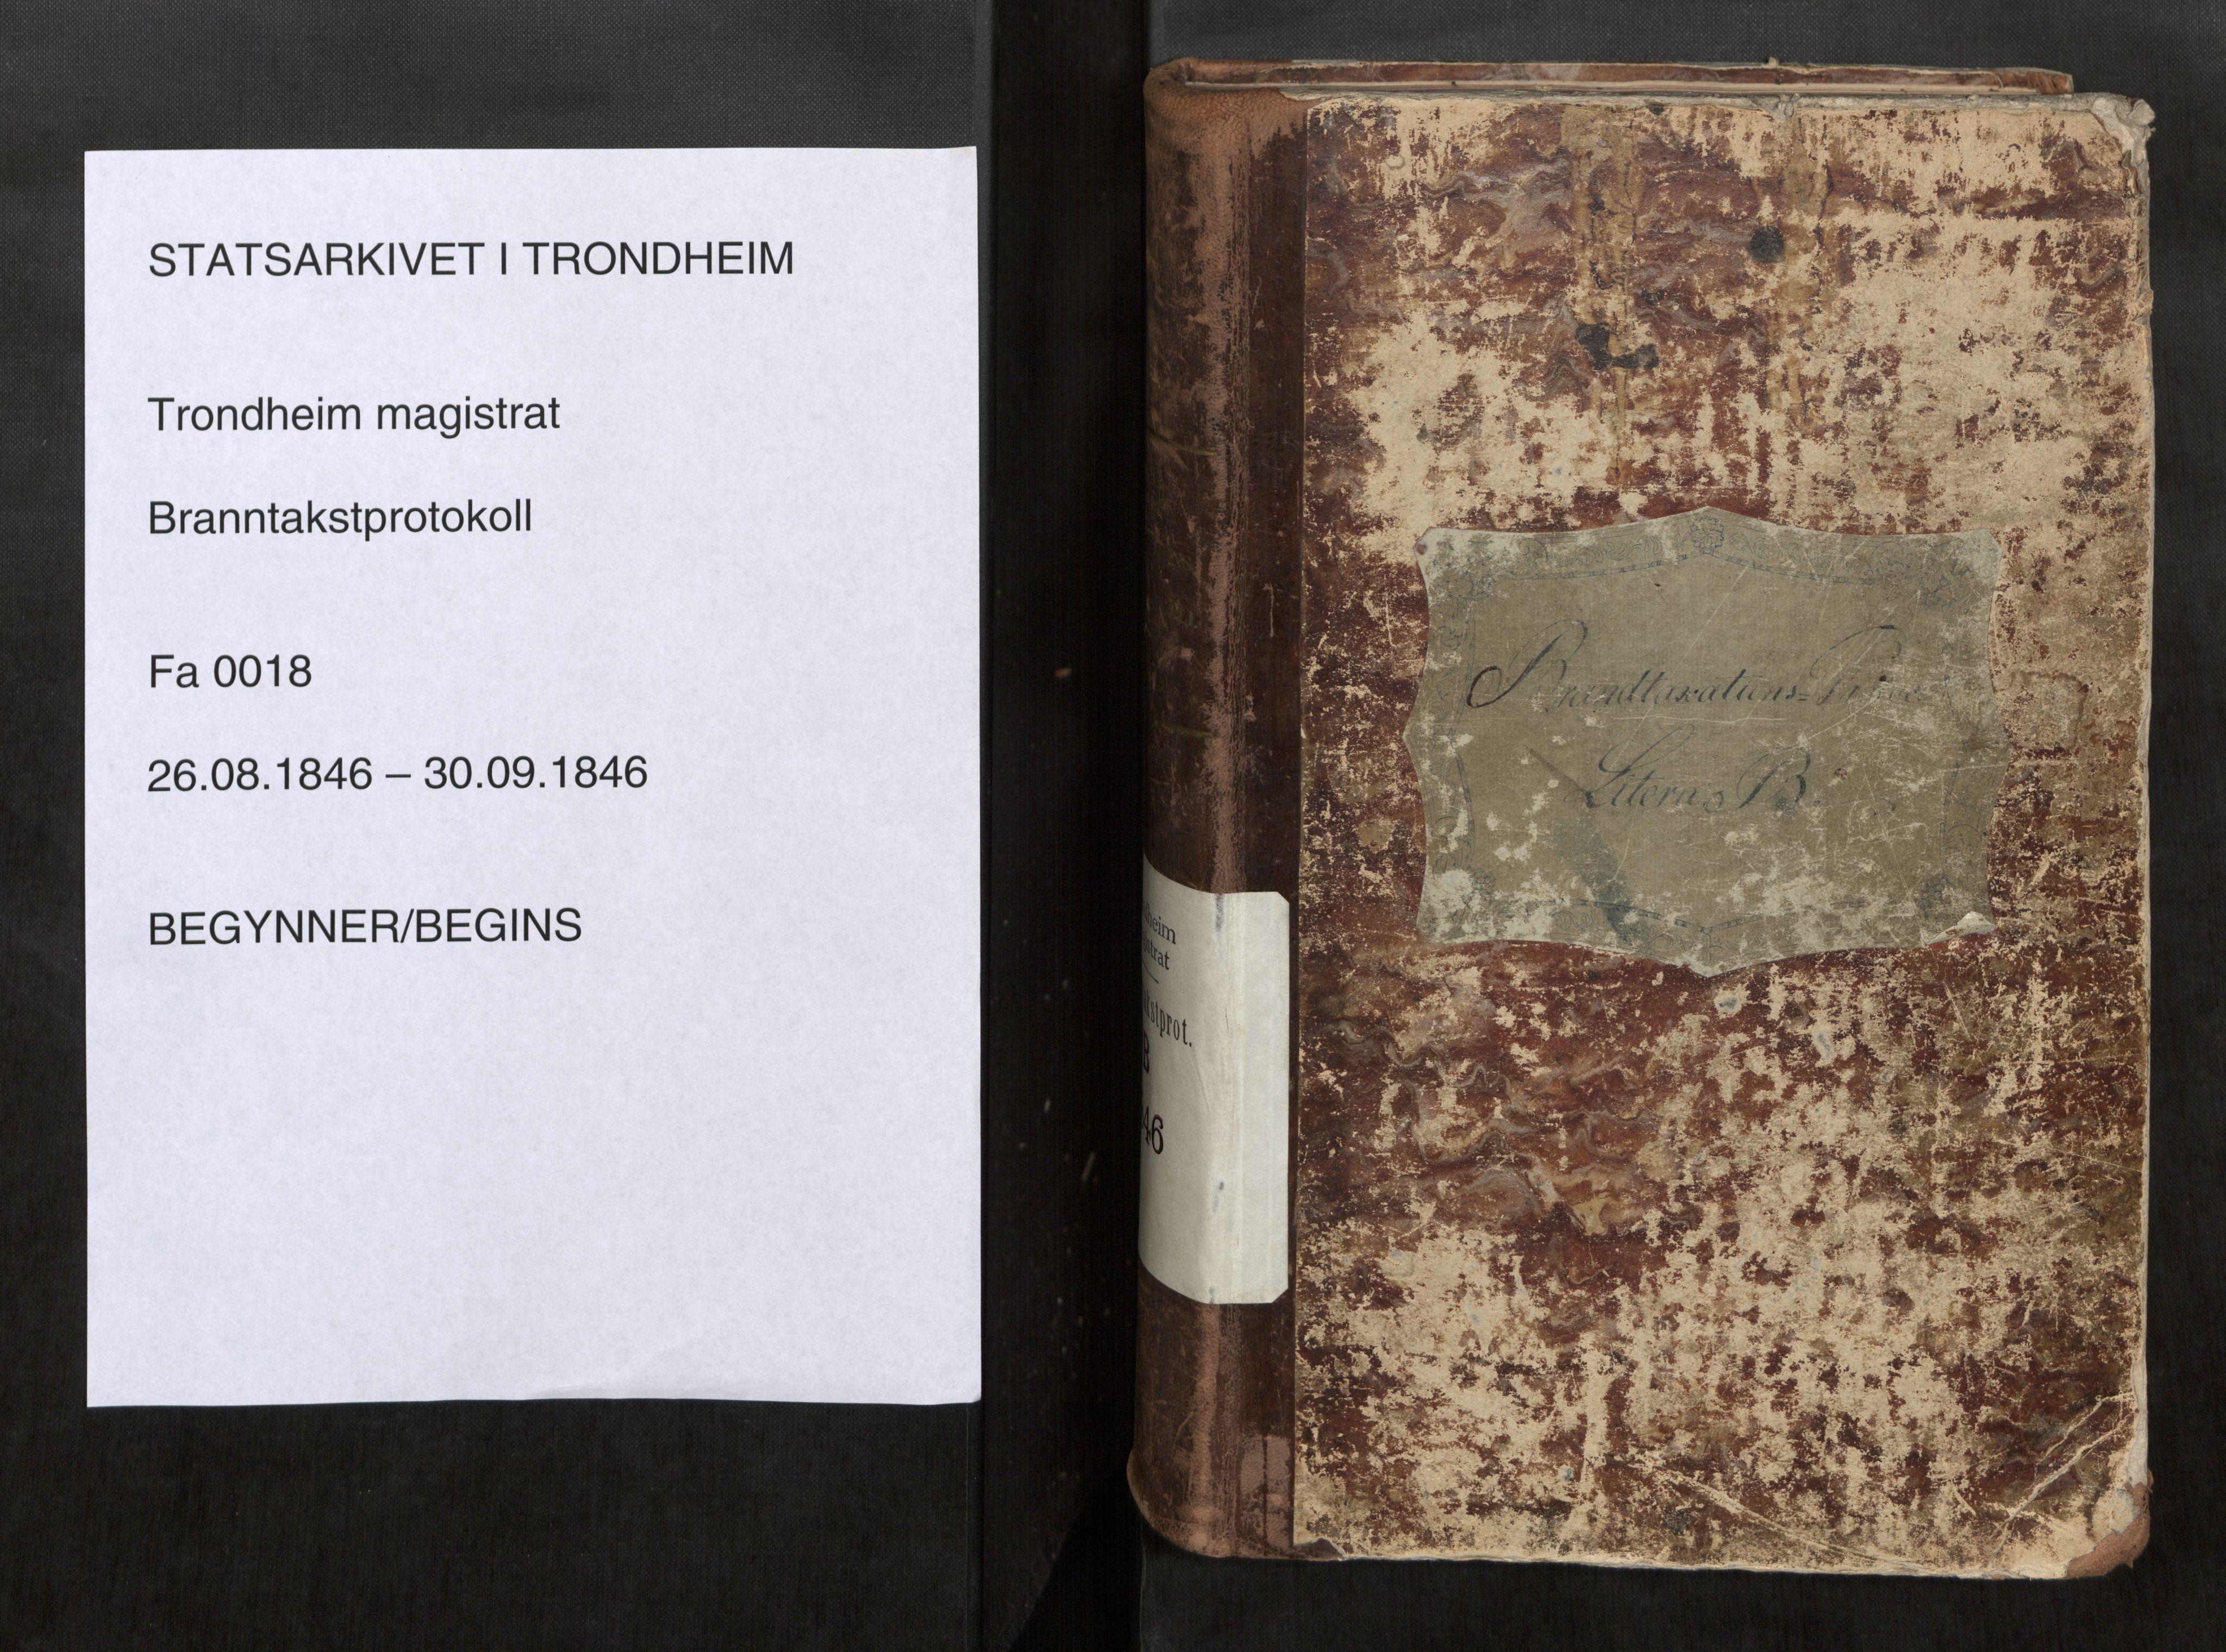 SAT, Norges Brannkasse Trondheim magistrat, Branntakstprotokoller med tekst, nr. 18: 1846, 1846